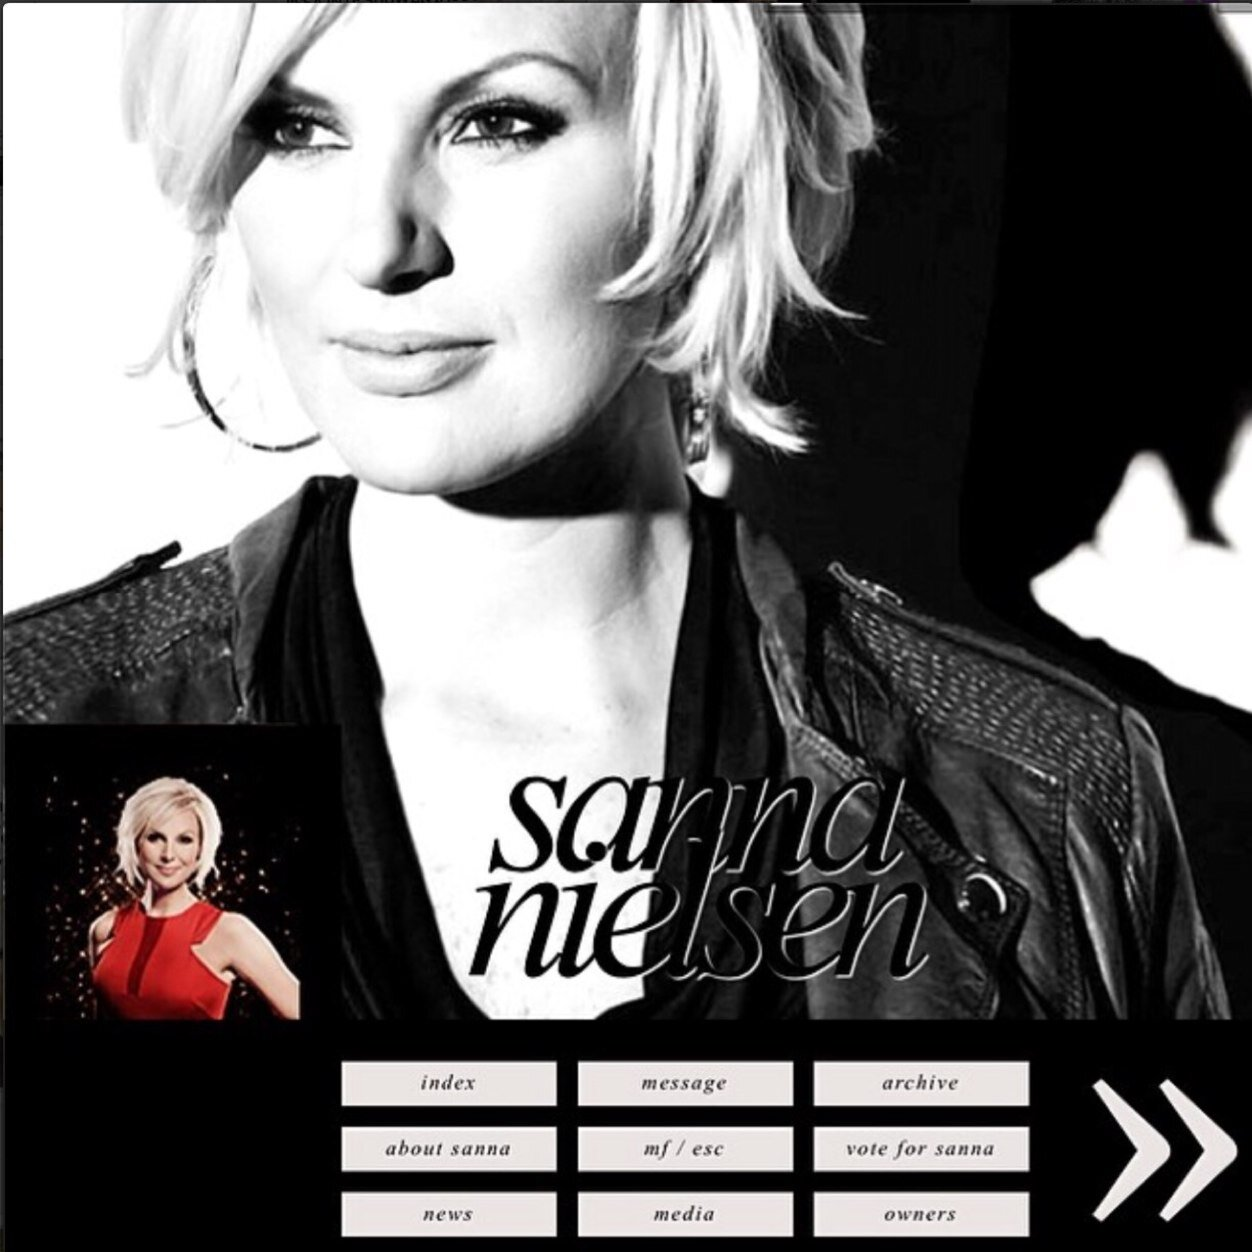 Sanna Nielsen: Sanna.nielsen.news (@SannaNews)